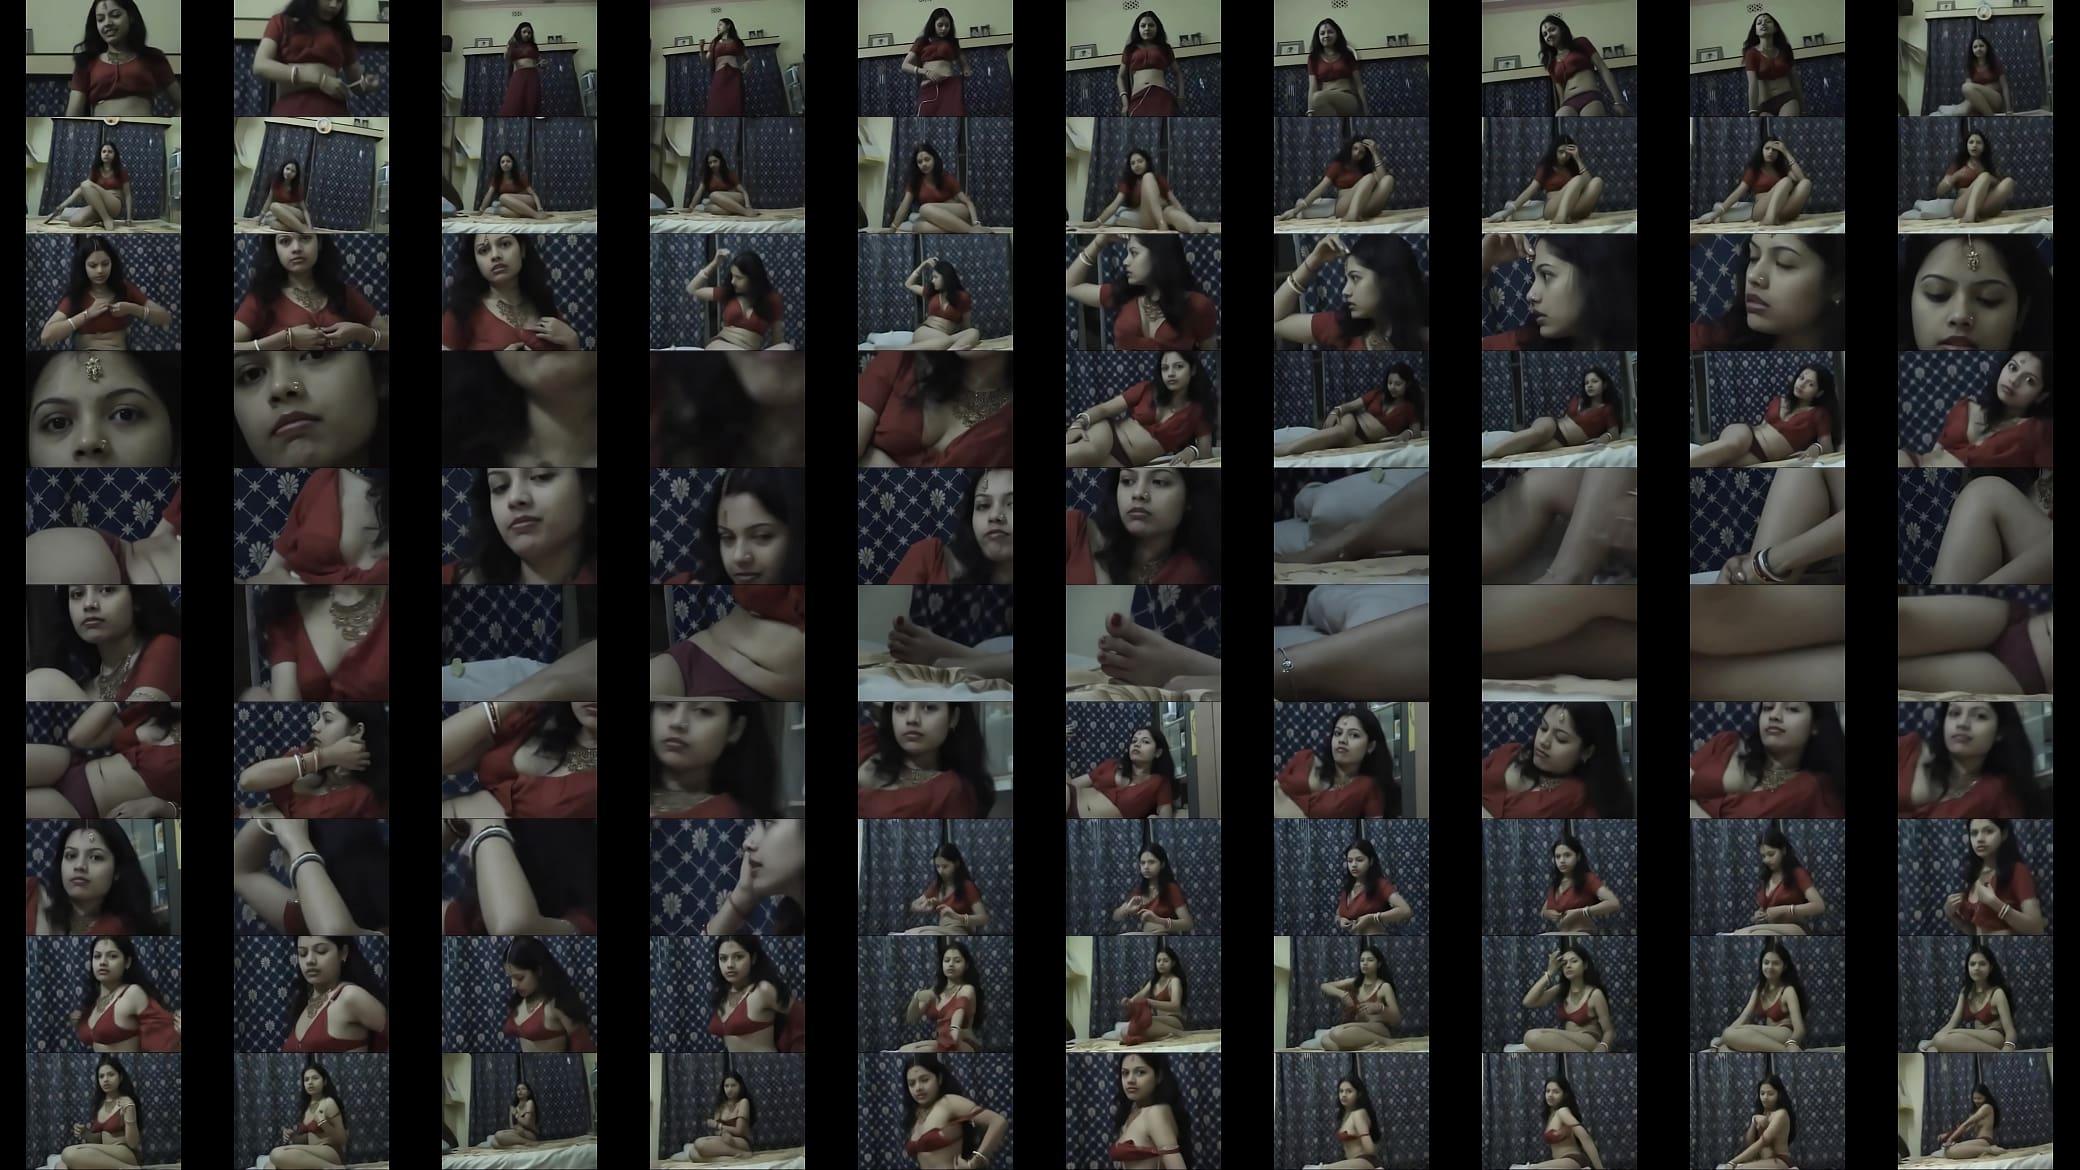 White photos vanna young naked